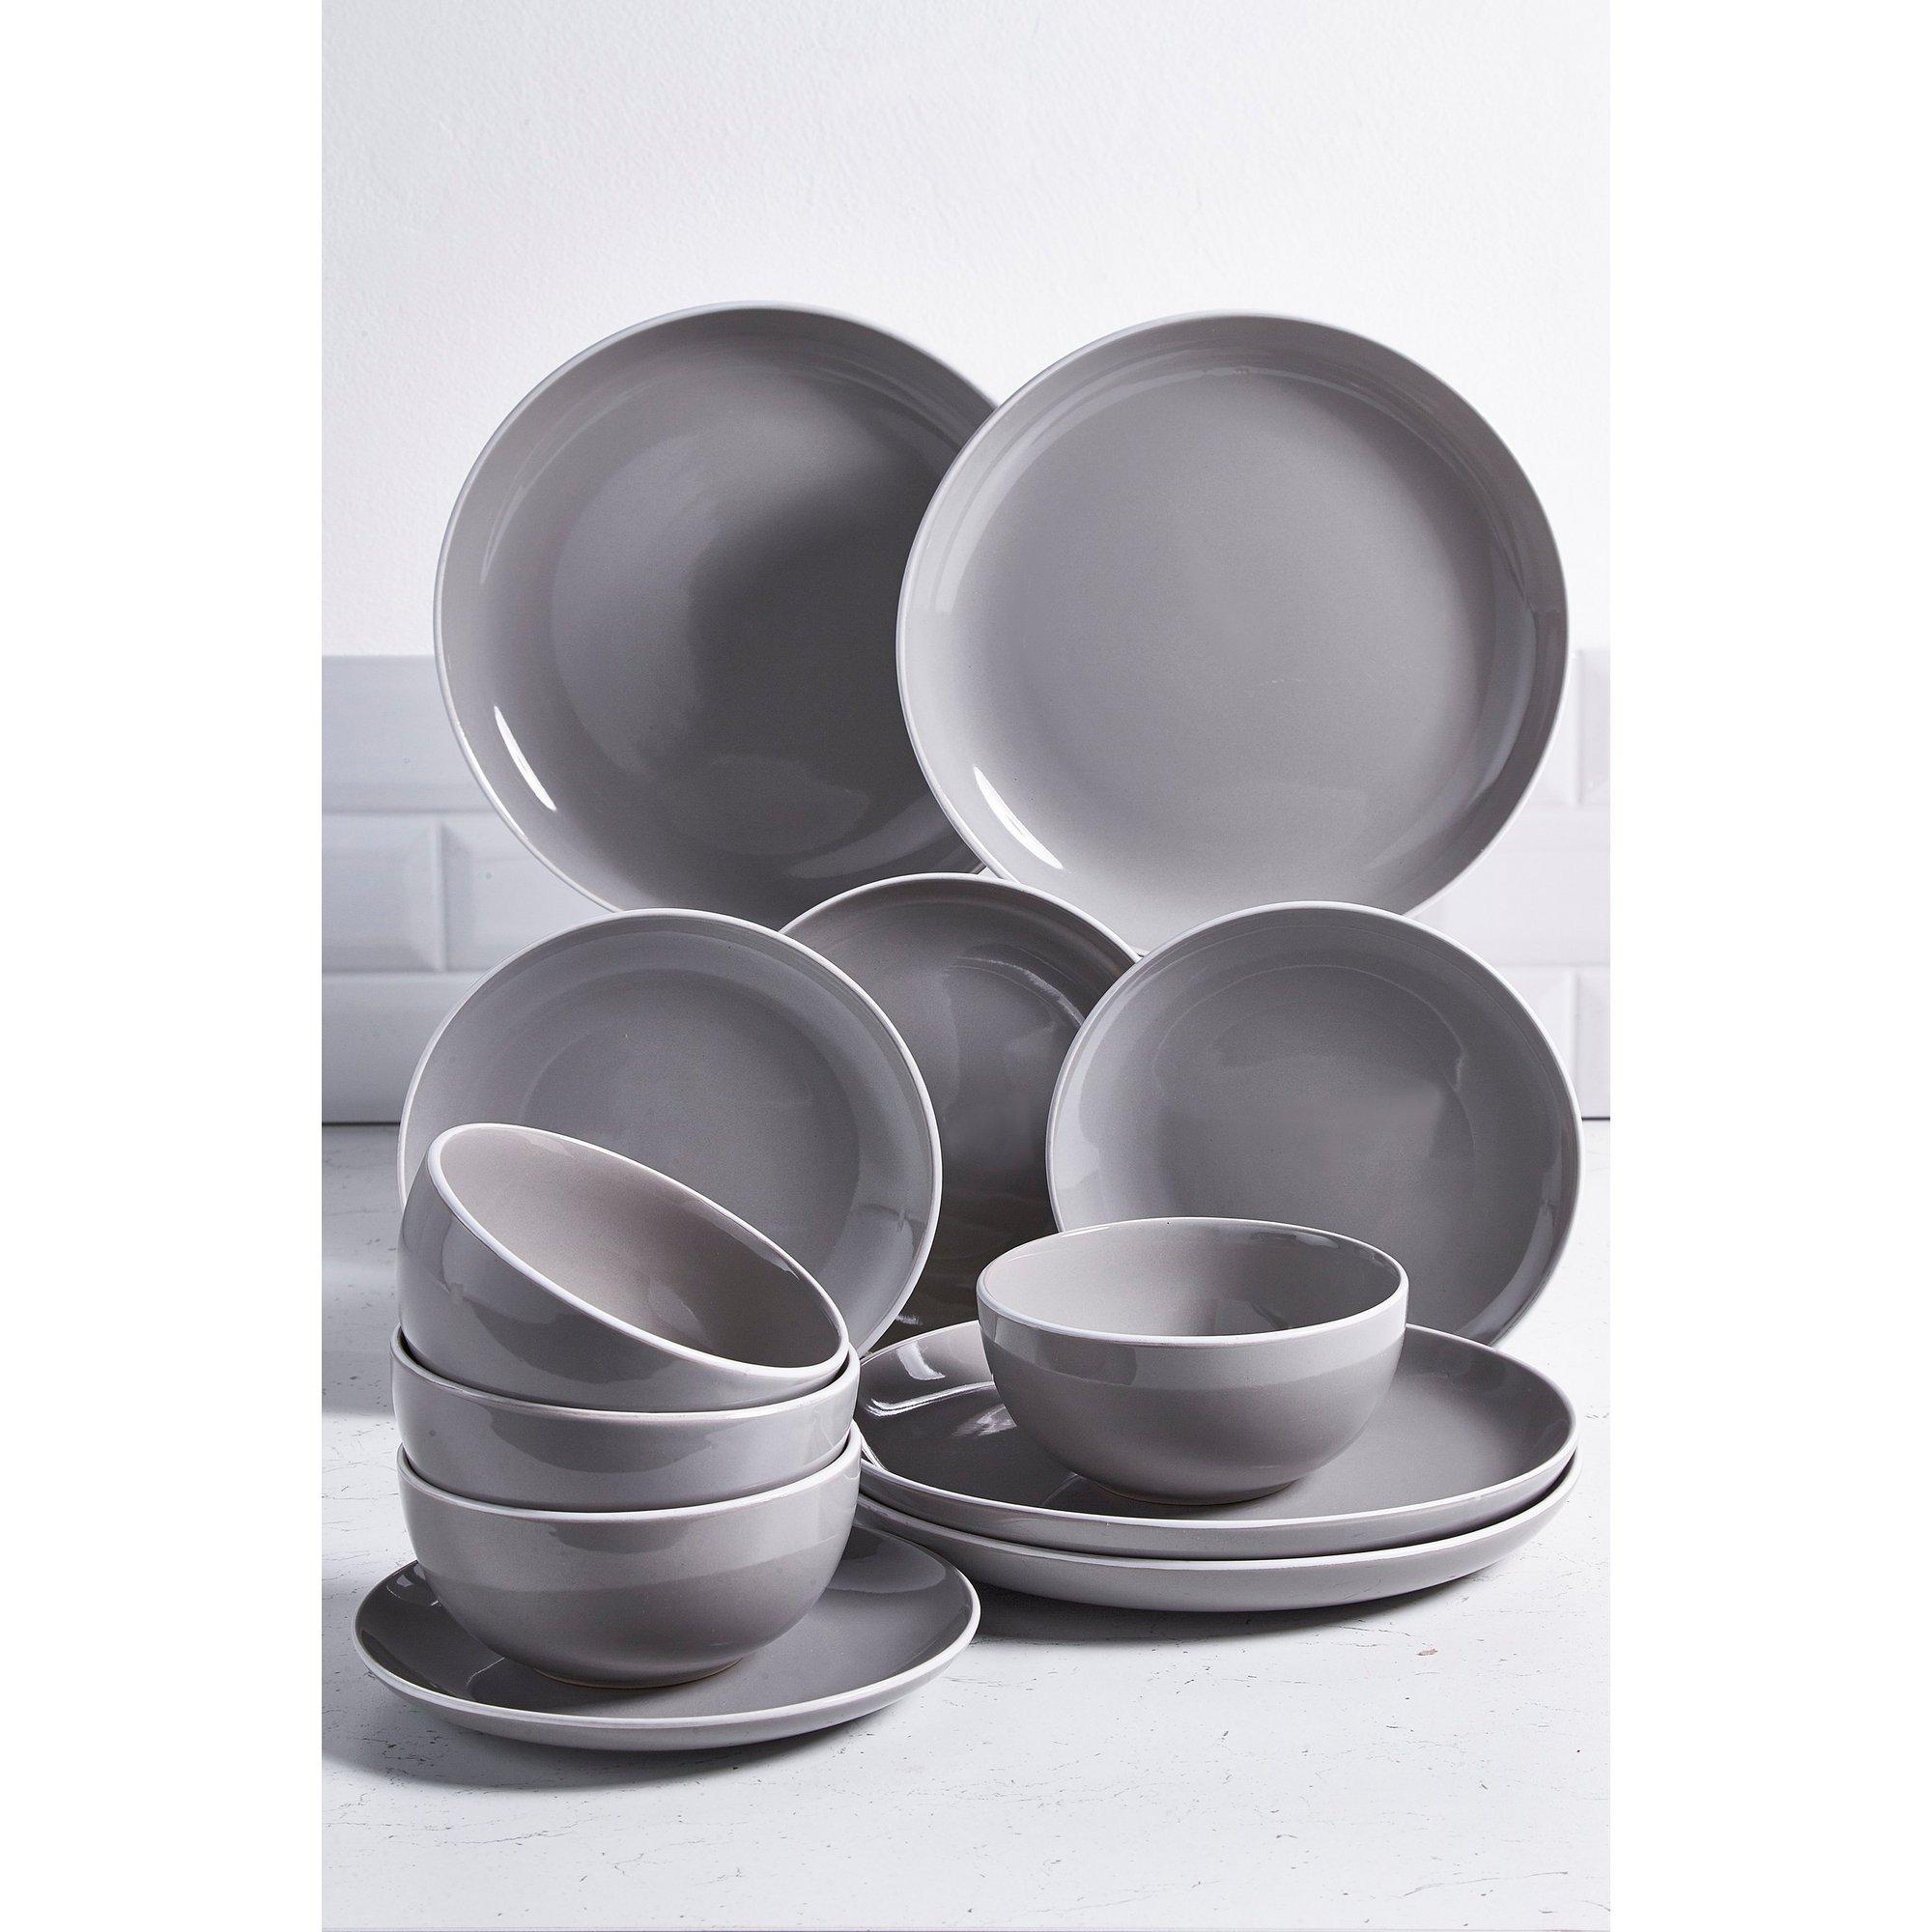 Image of 12 Piece Grey Halo Stoneware Dinner Set